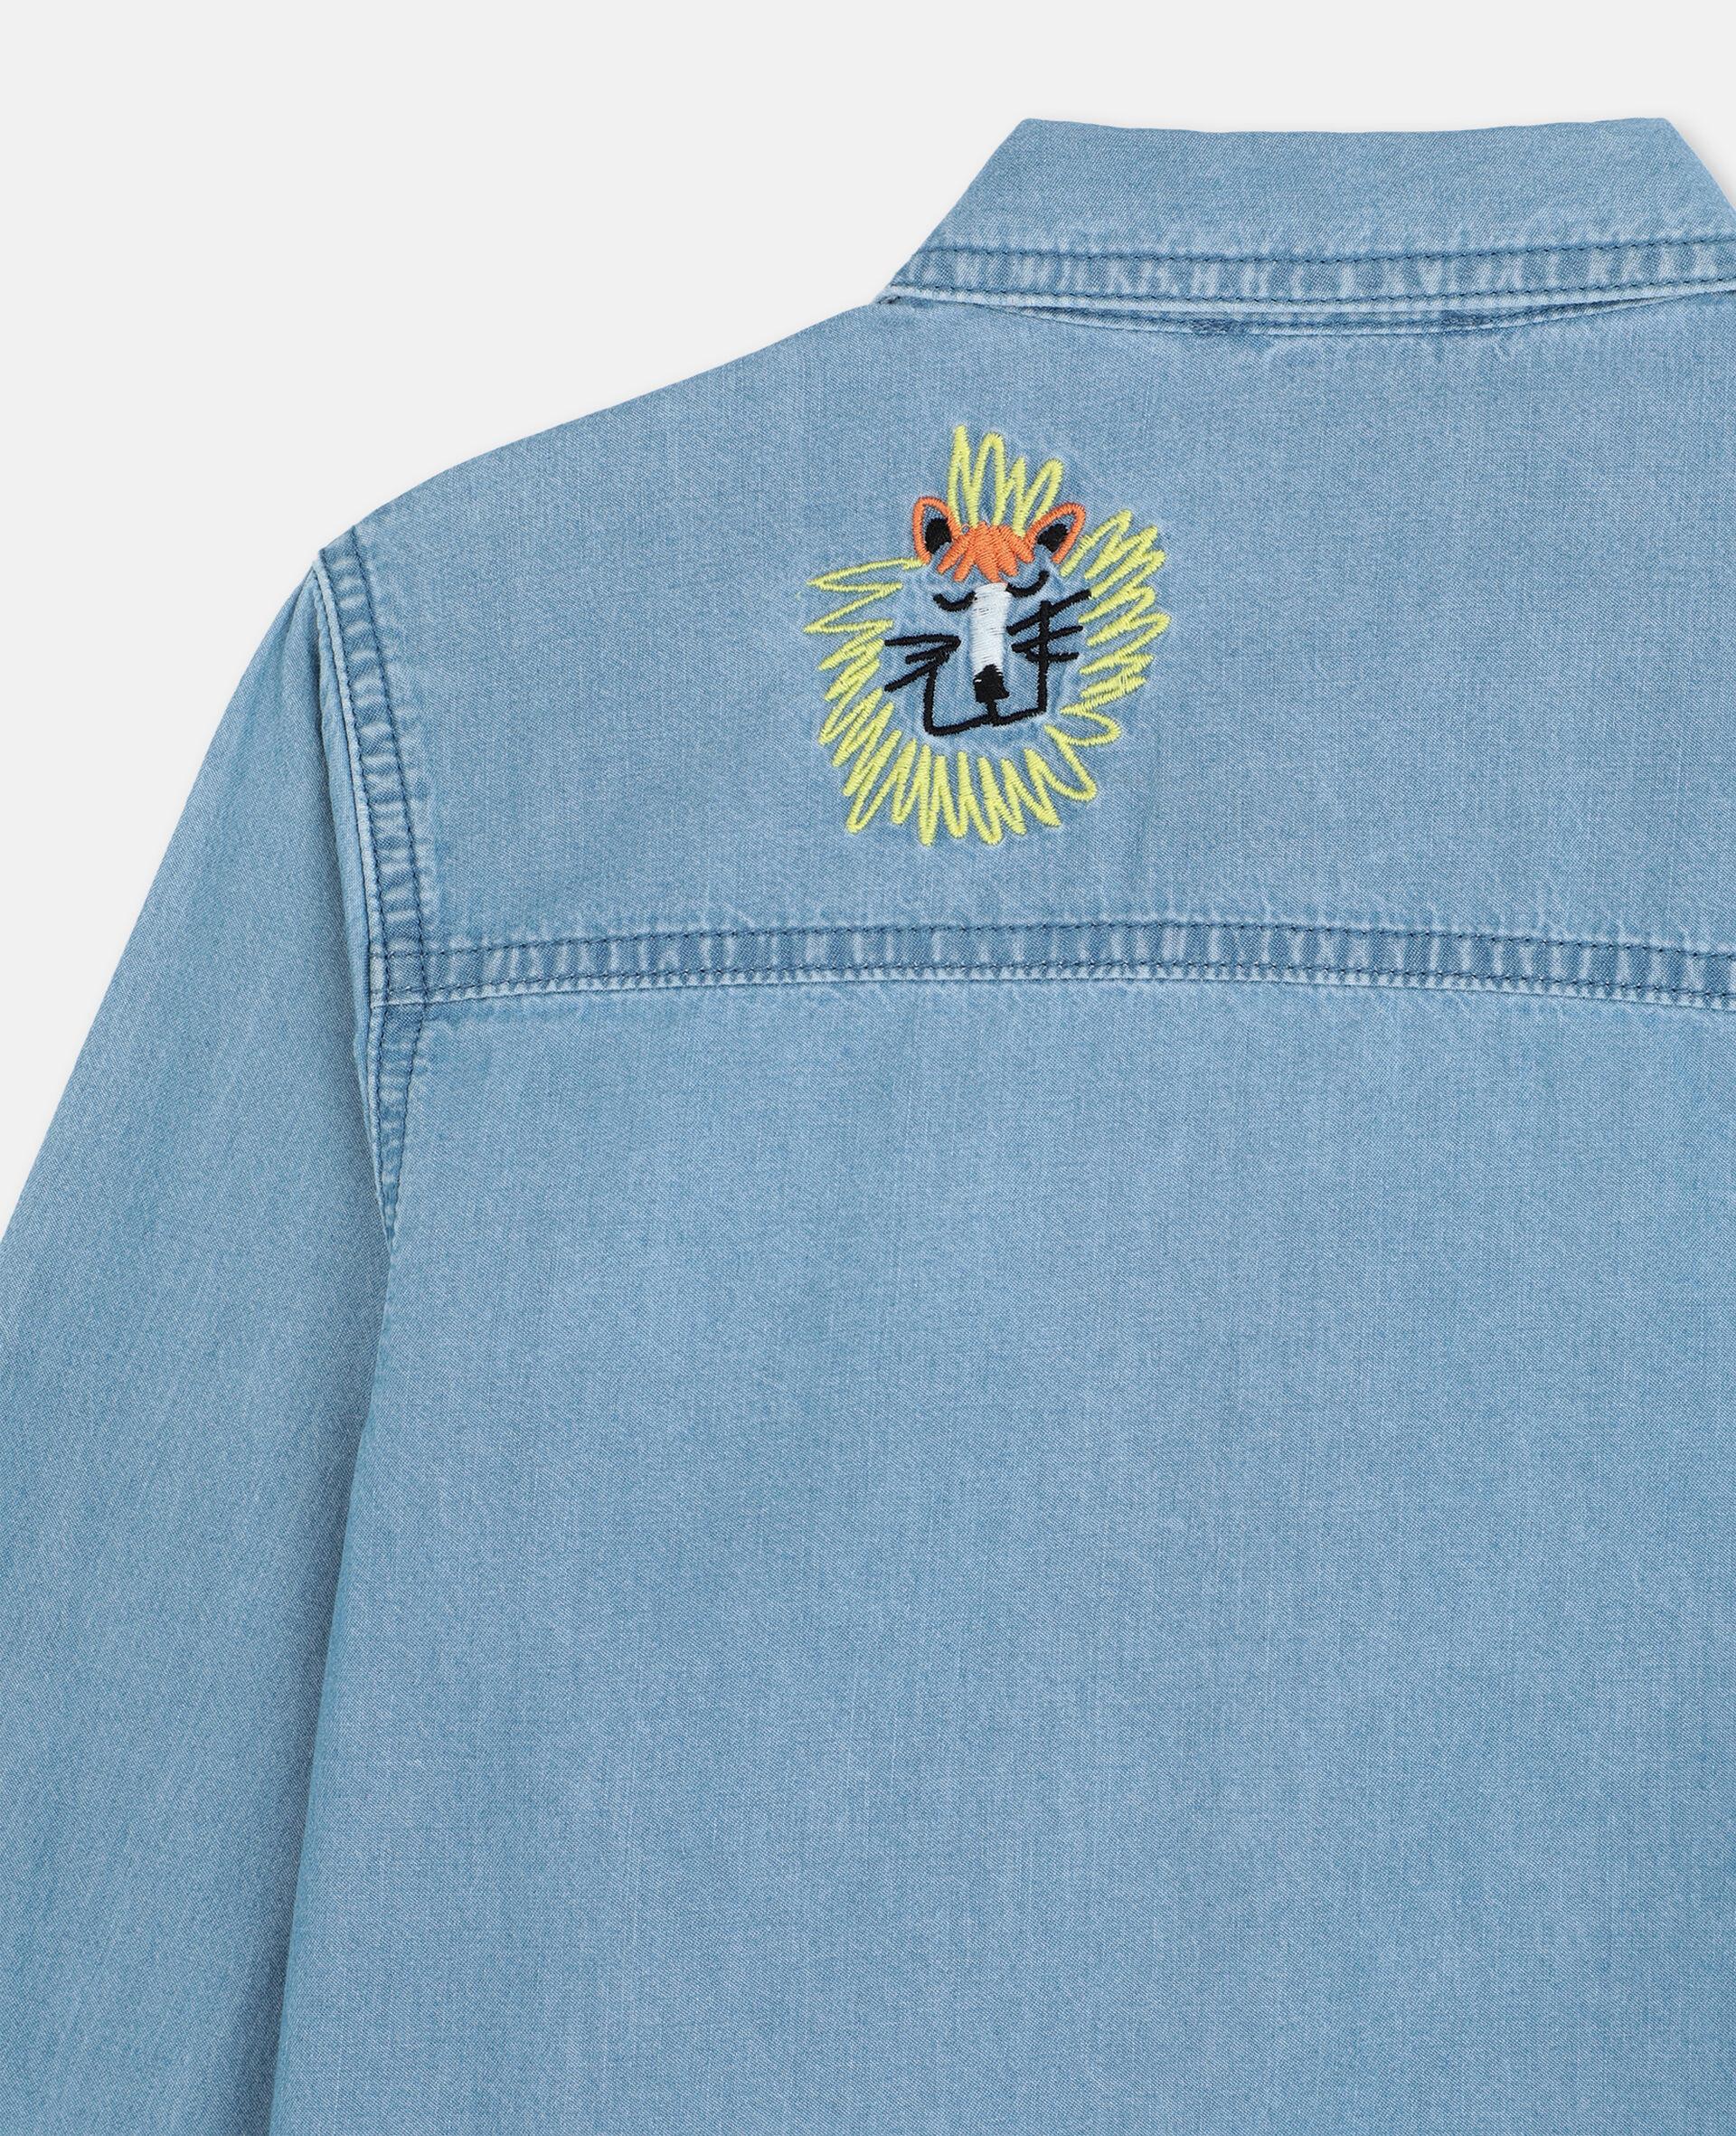 Embroidered Cats 棉质钱布雷布衬衫 -蓝色-large image number 2